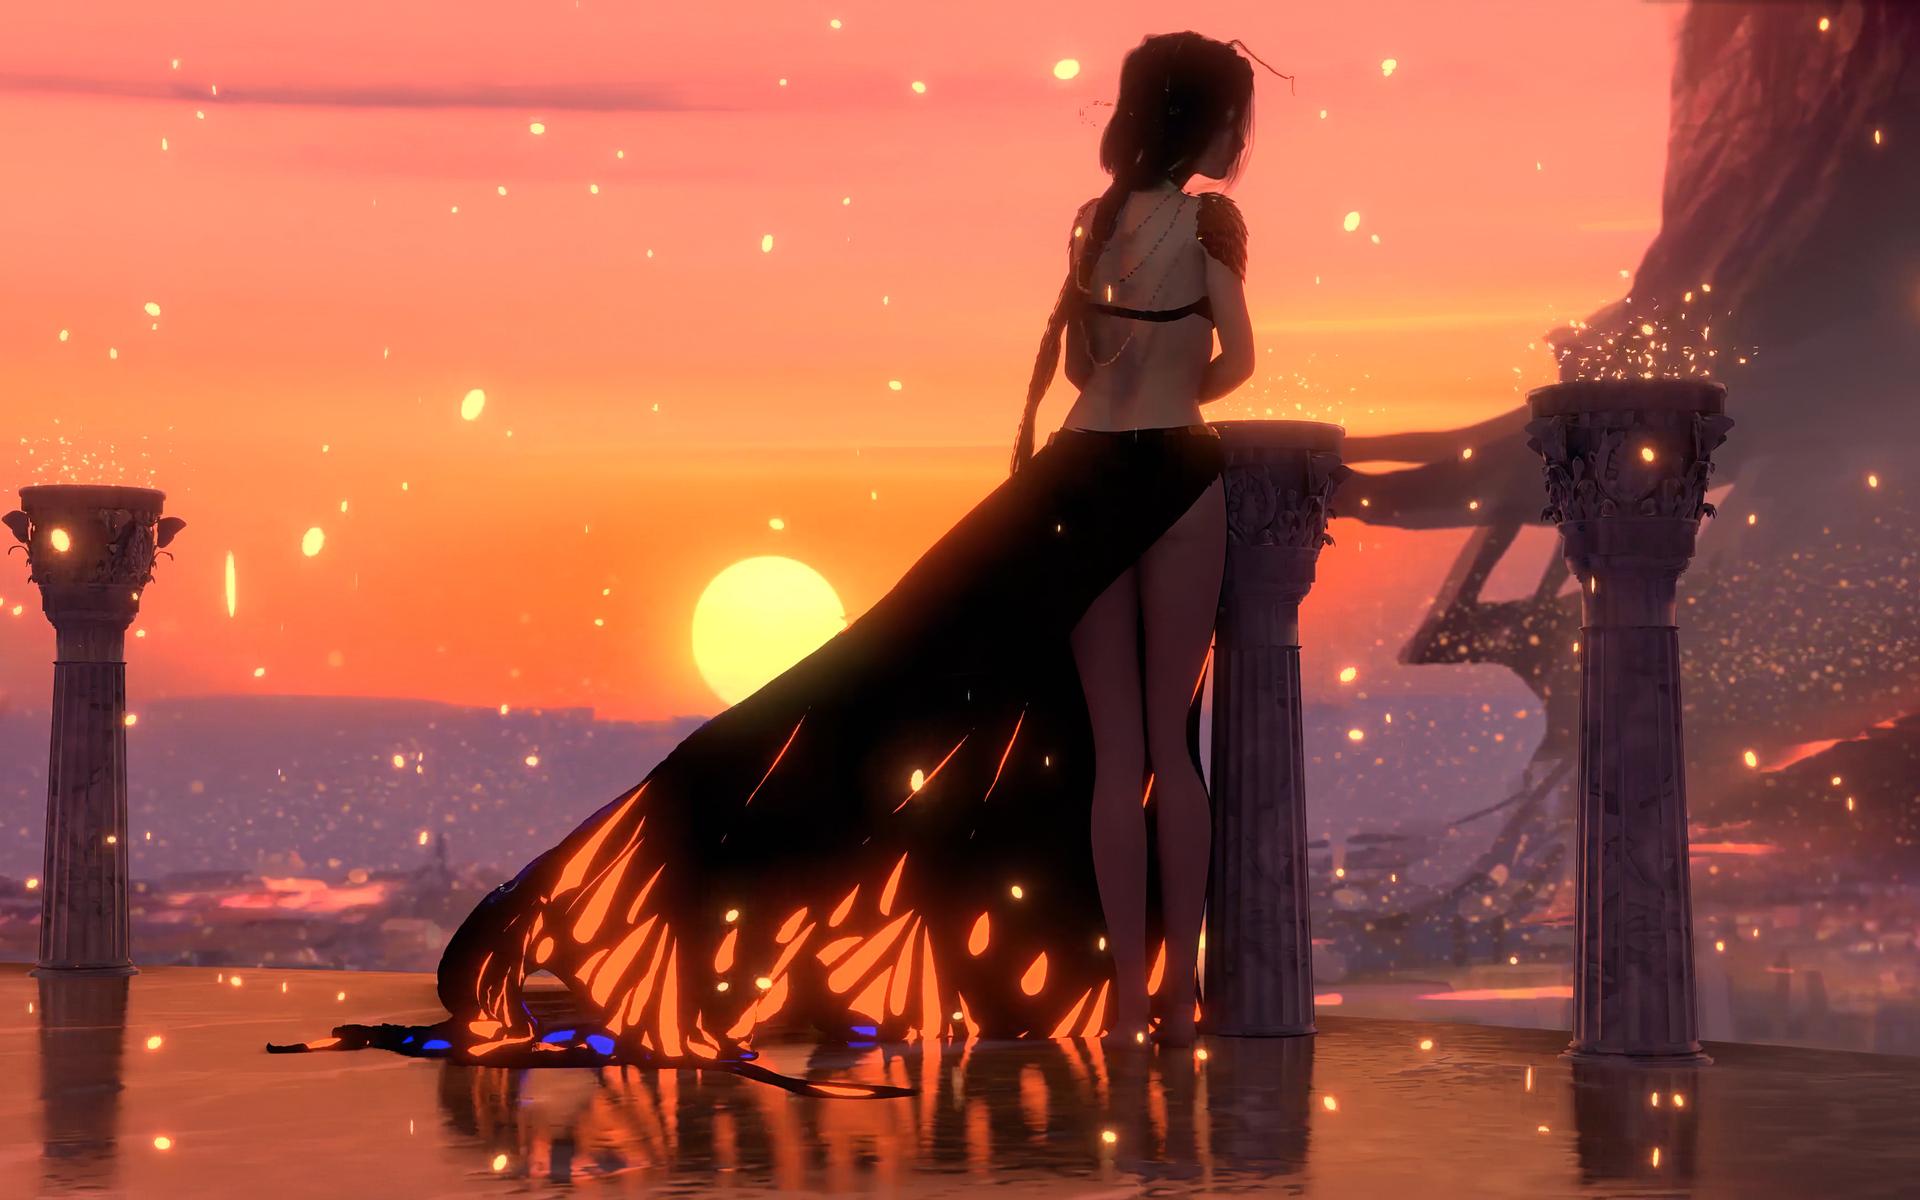 wlop-anime-girl-sunset-4k-wf.jpg